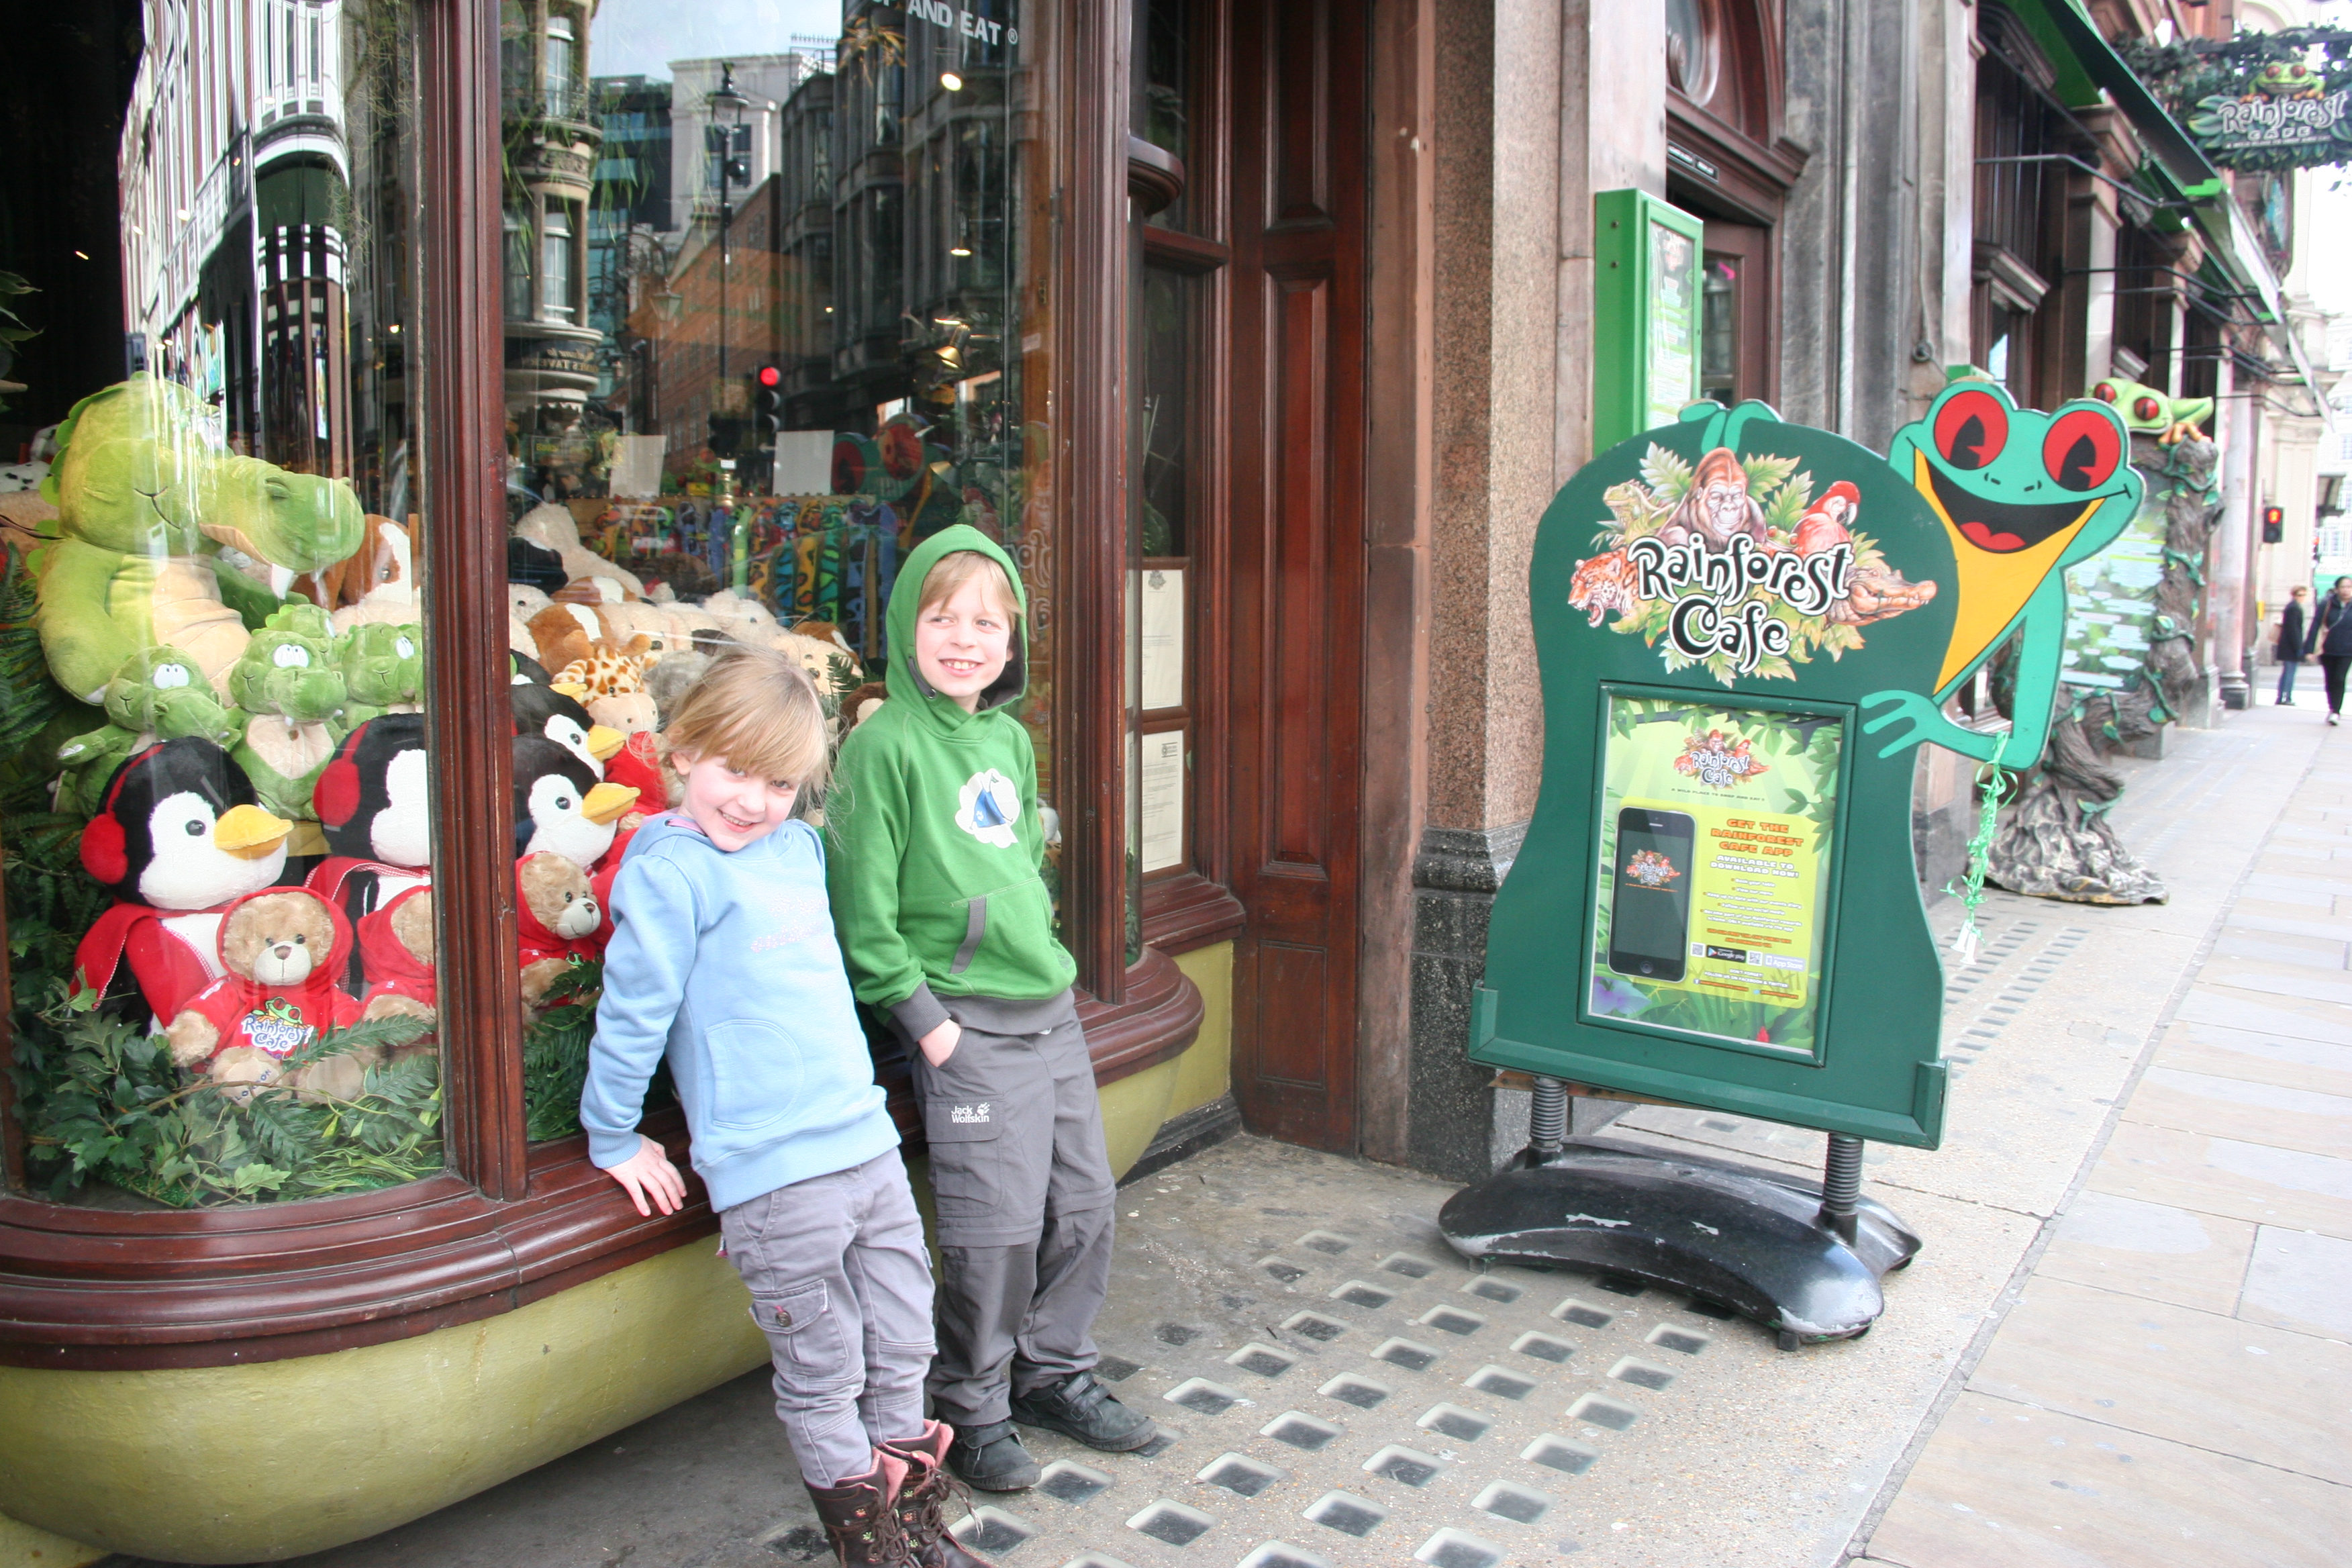 Rainforest cafe london a restaurant review for Rainforest londra